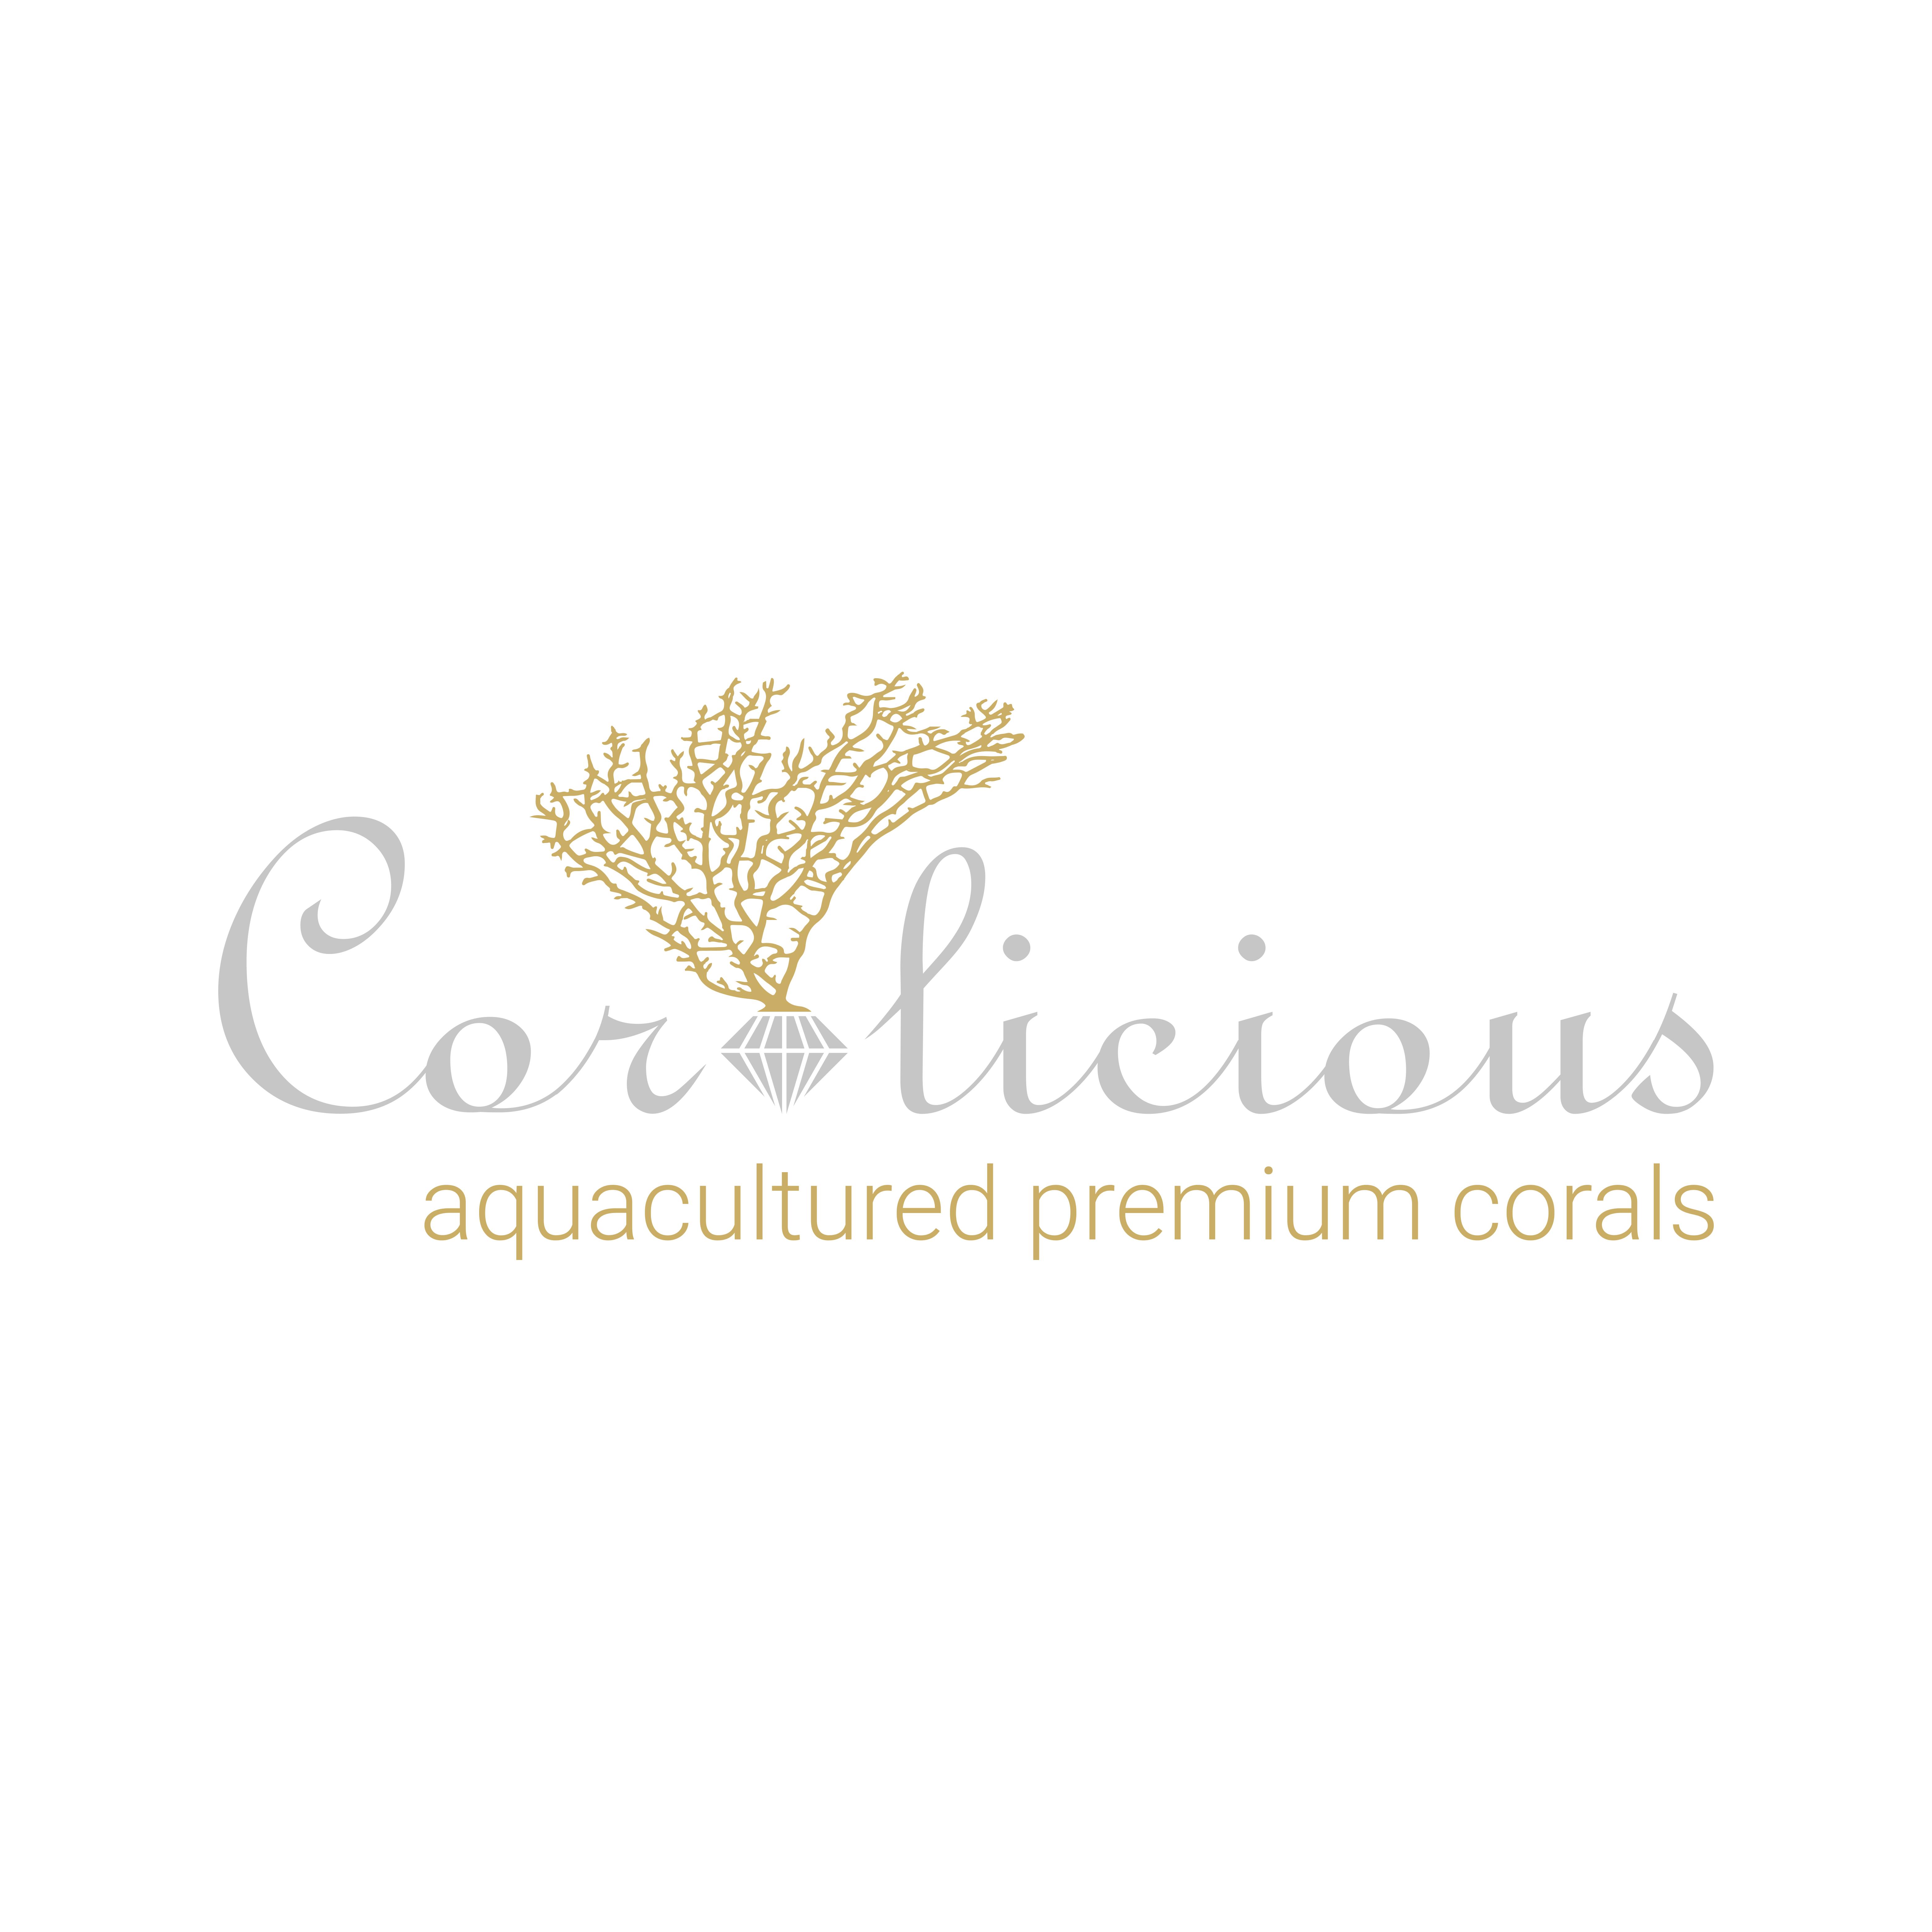 Coralicious